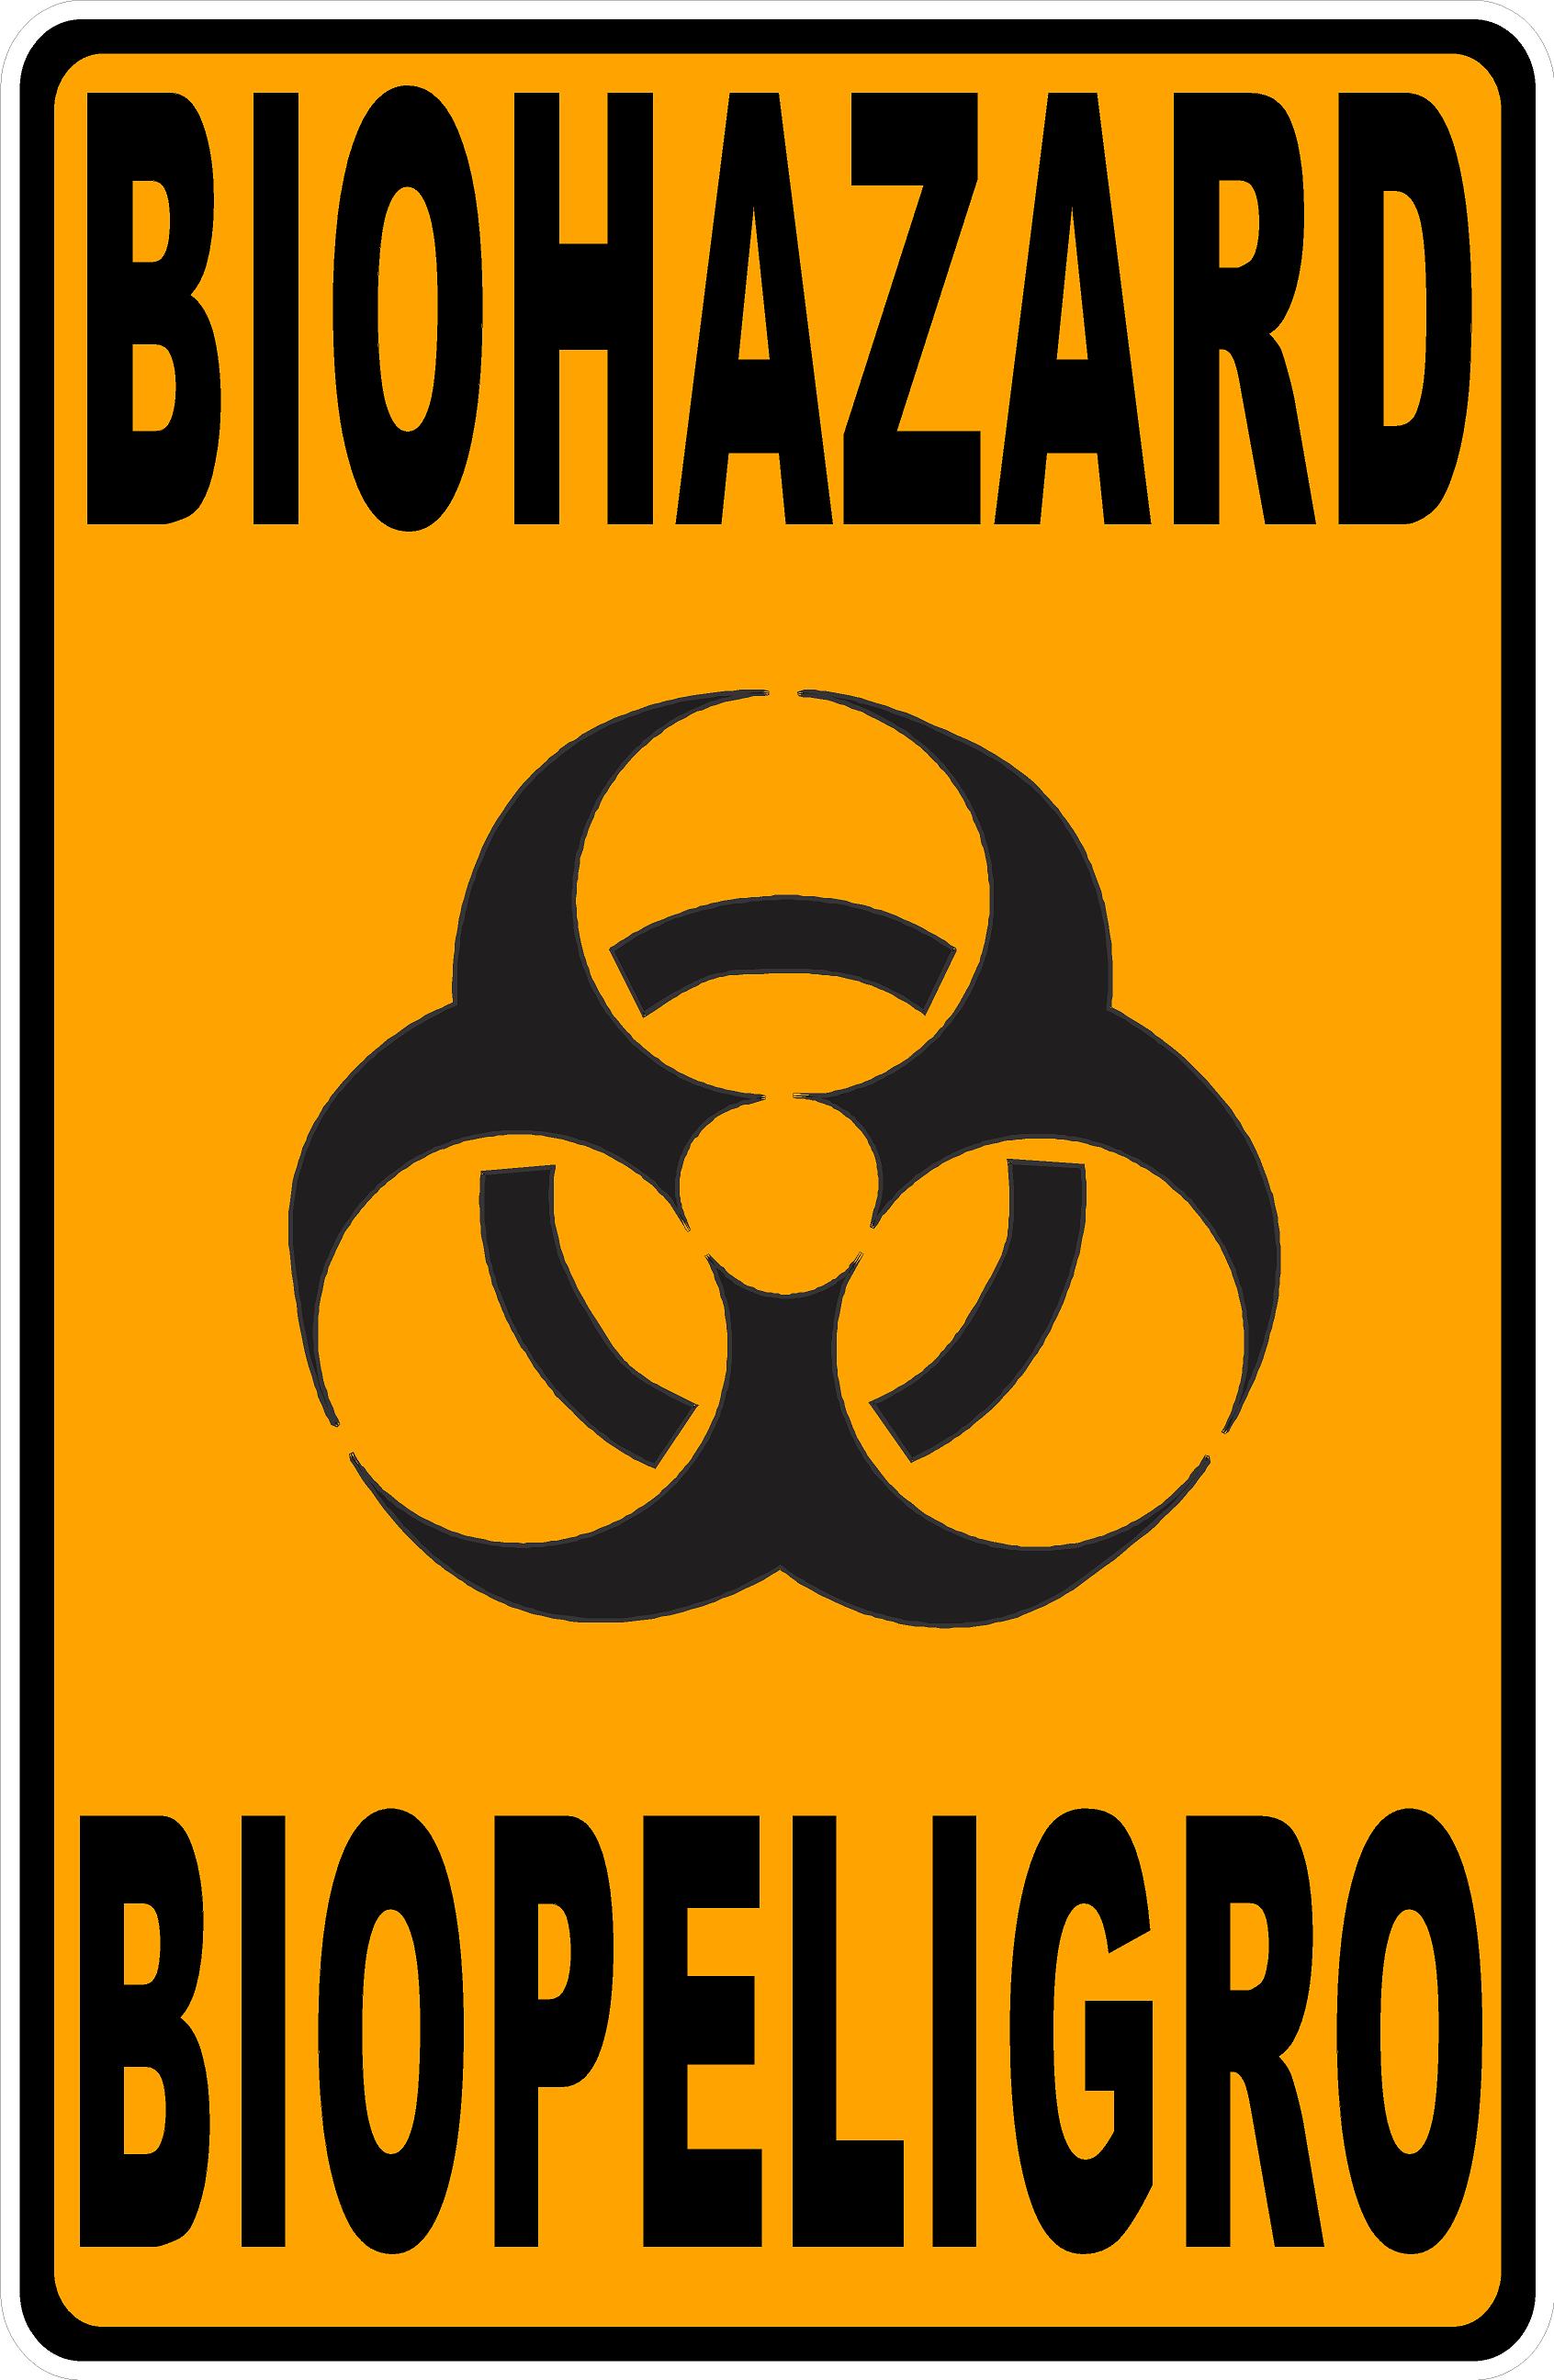 Bilingual Biohazard Sign Biopeligro Biohazard Sign Biohazard Bilingual